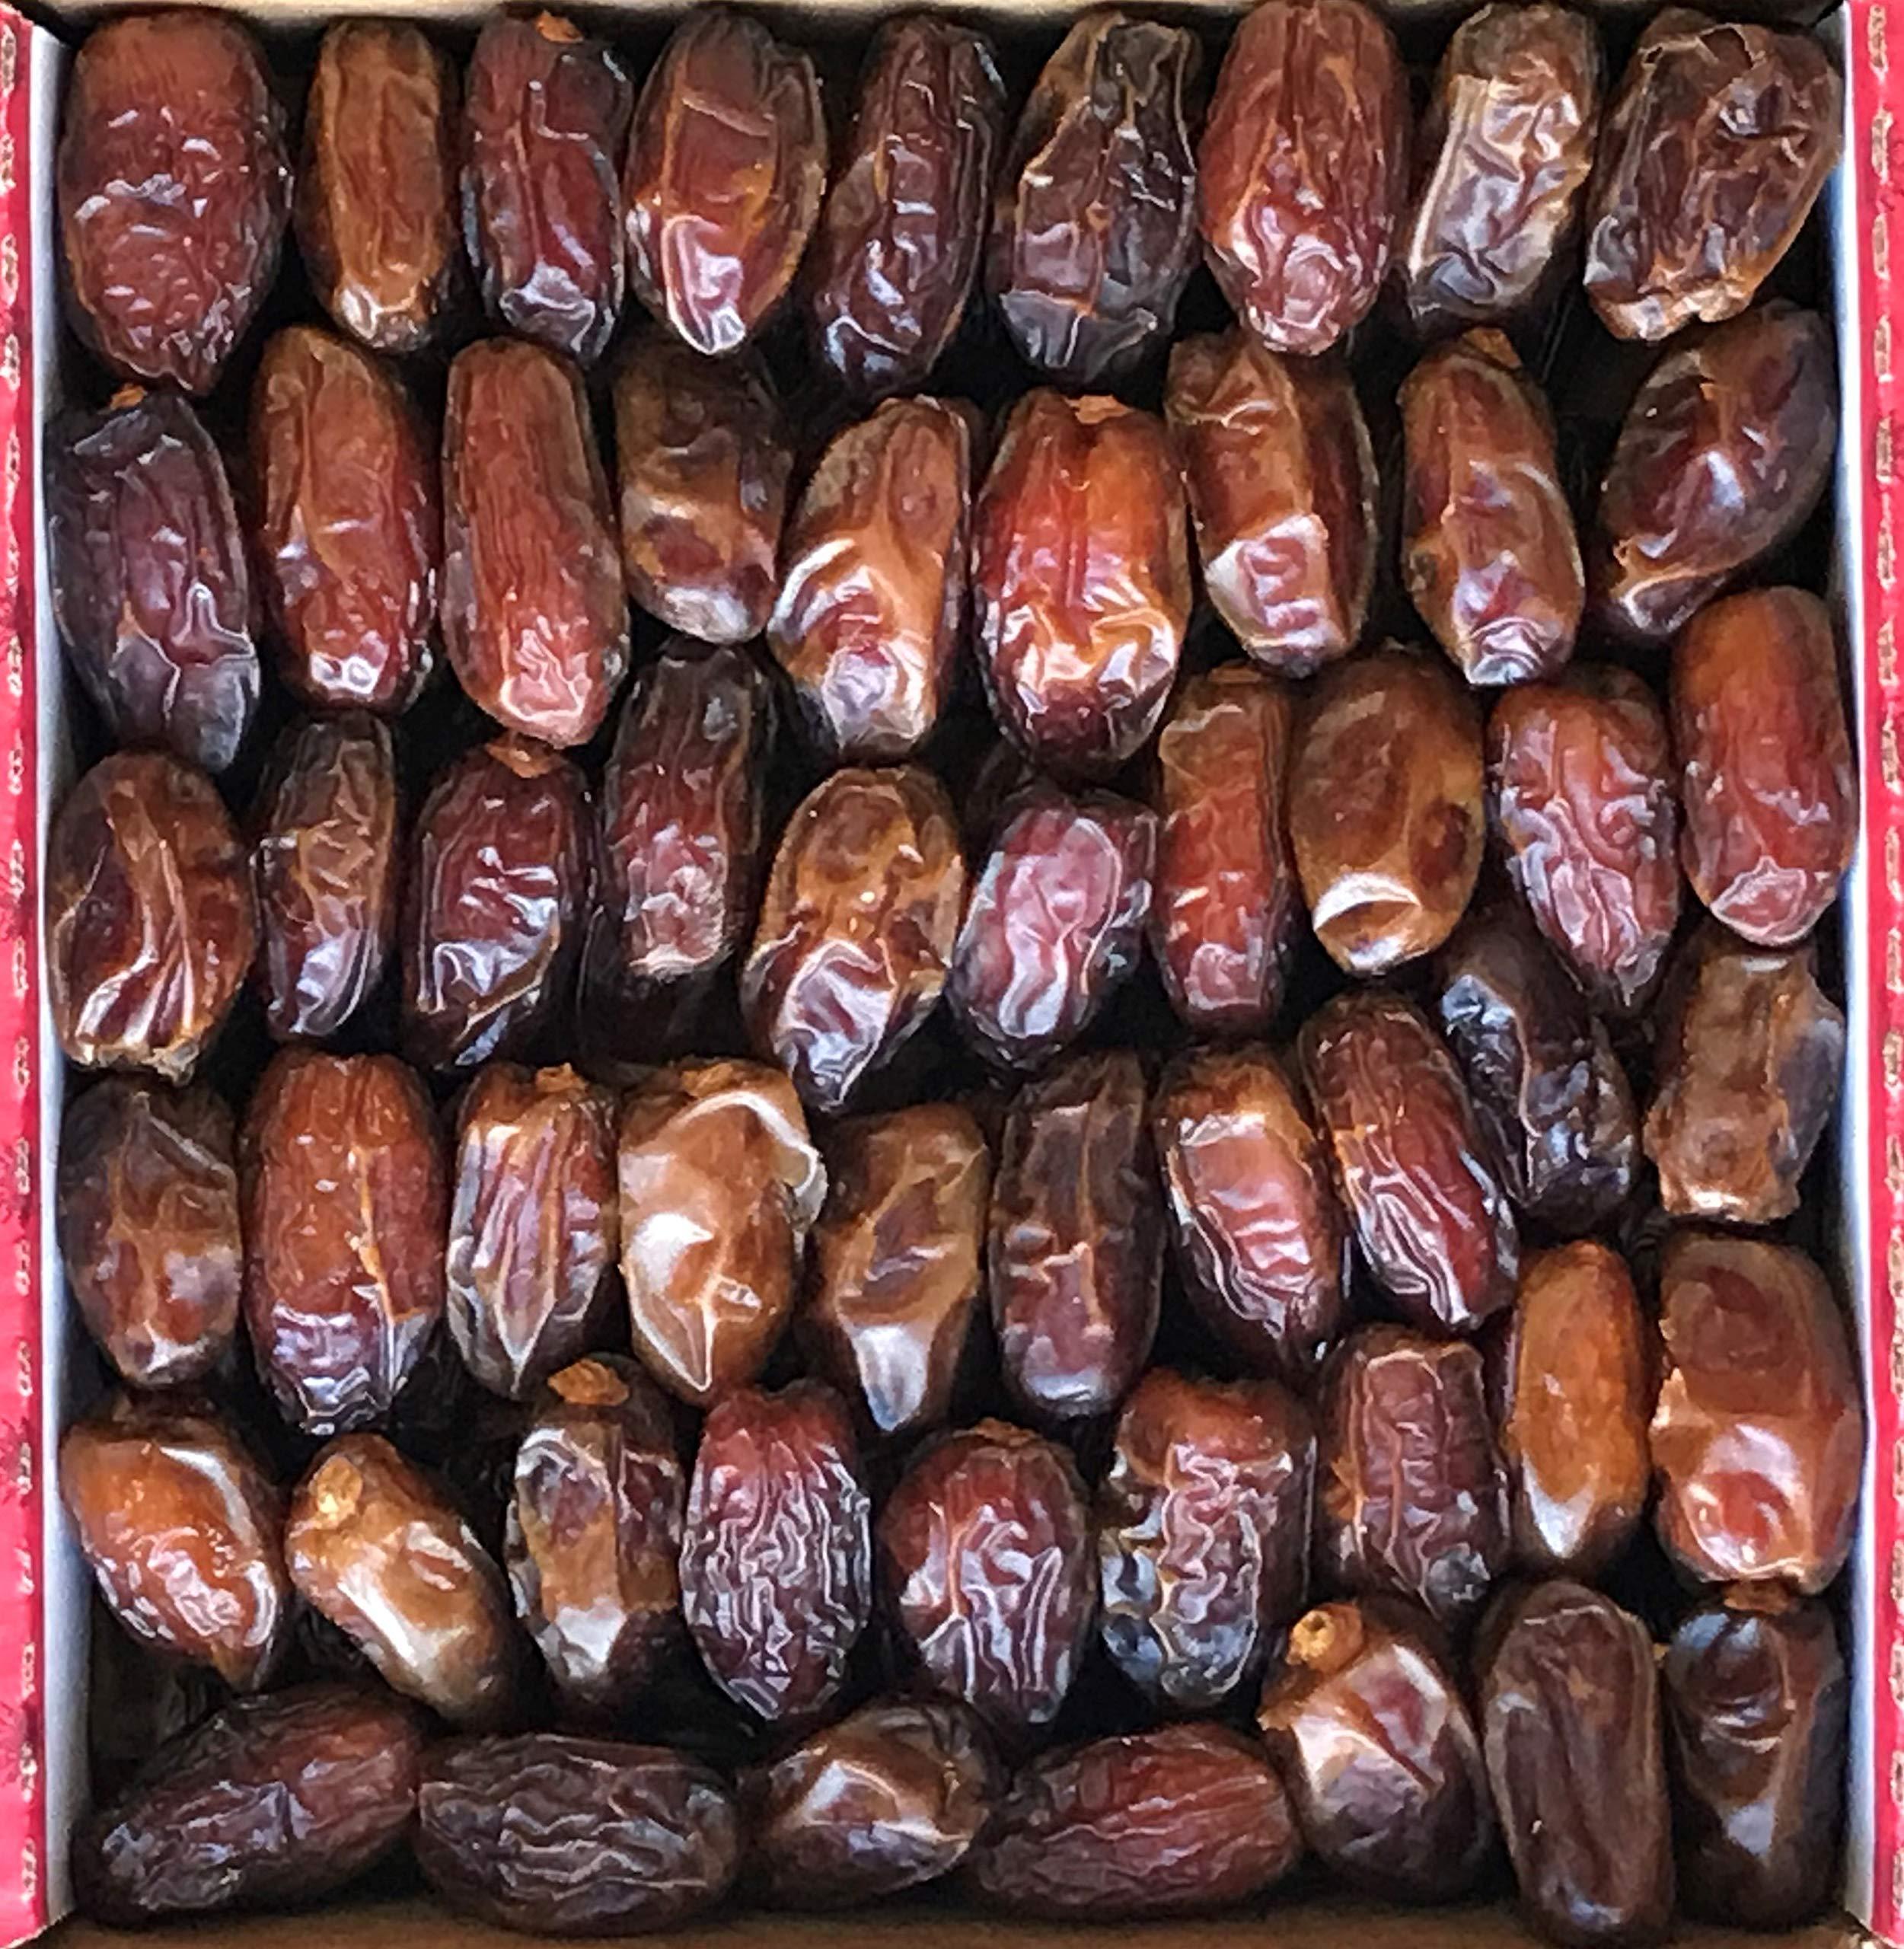 California Medjool Dates (Soft) from Aya Farms, 5 تمر مدجول